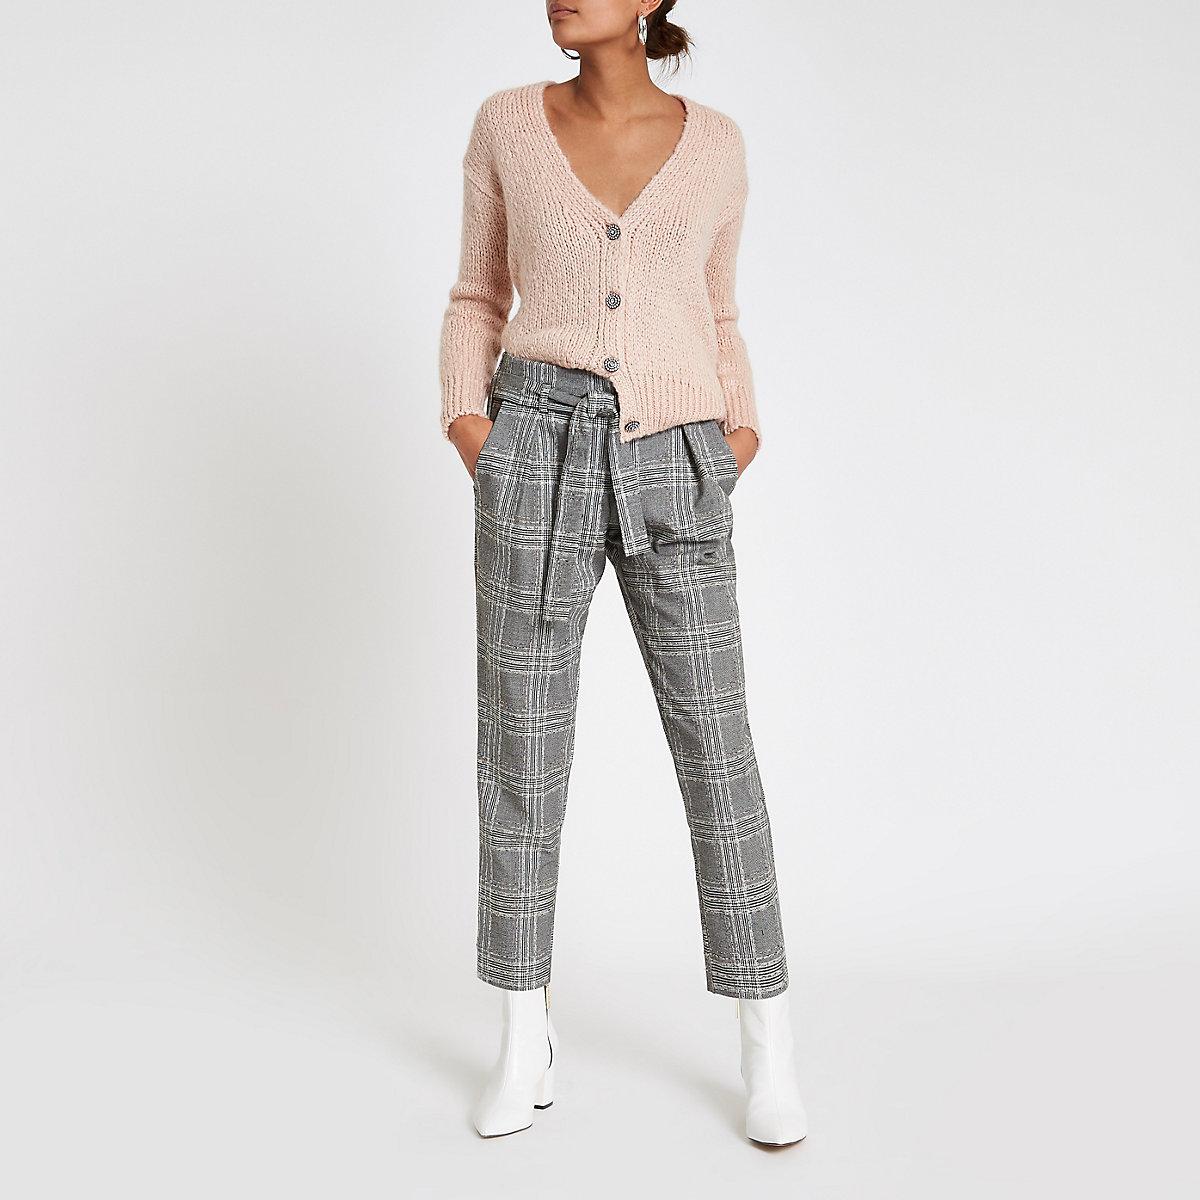 Pink rhinestone button knitted cardigan